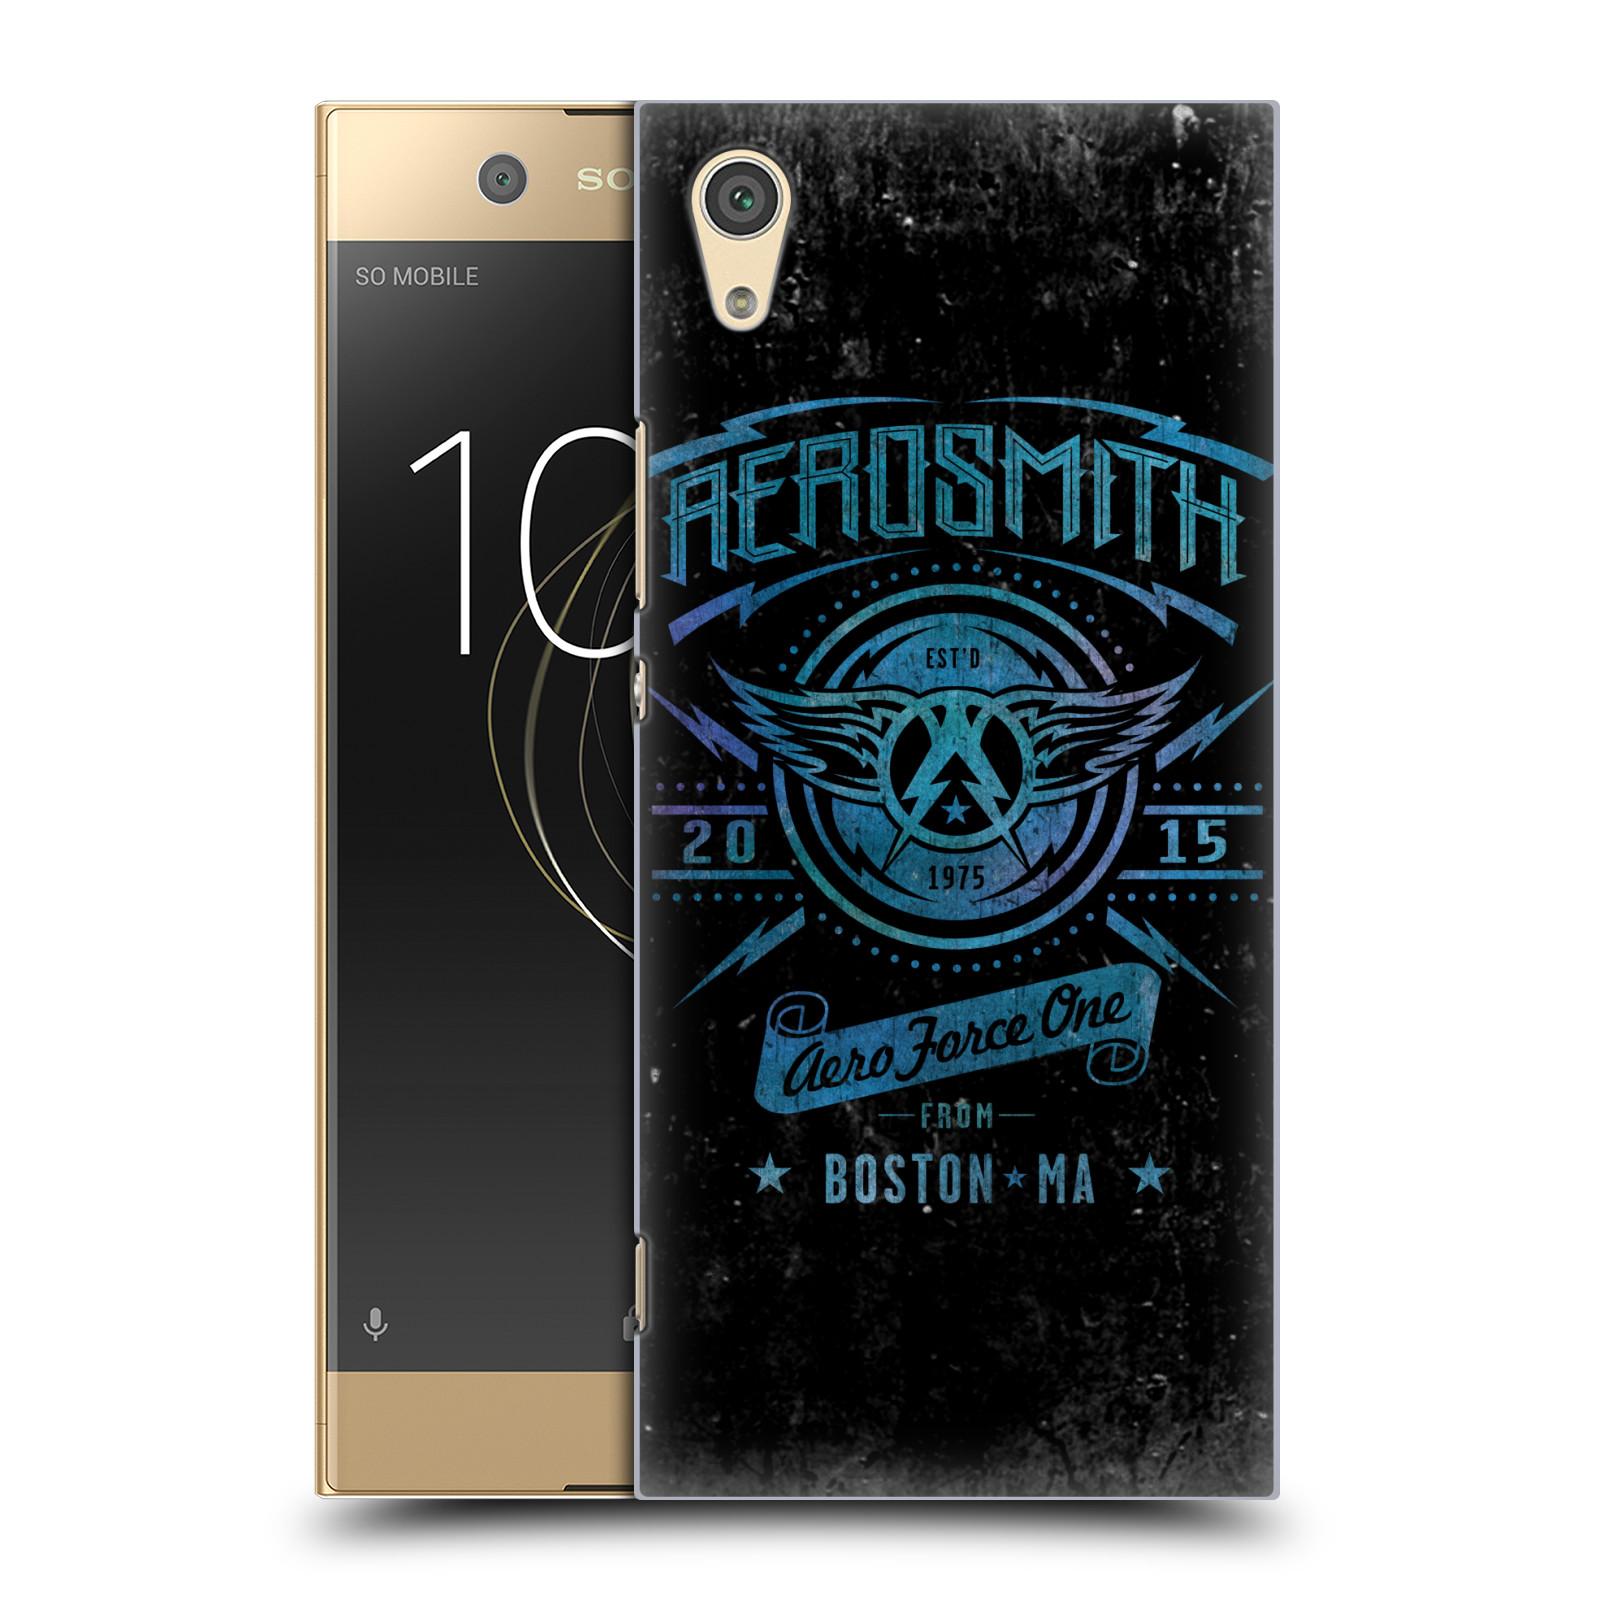 Plastové pouzdro na mobil Sony Xperia XA1 - Head Case - Aerosmith - Aero Force One